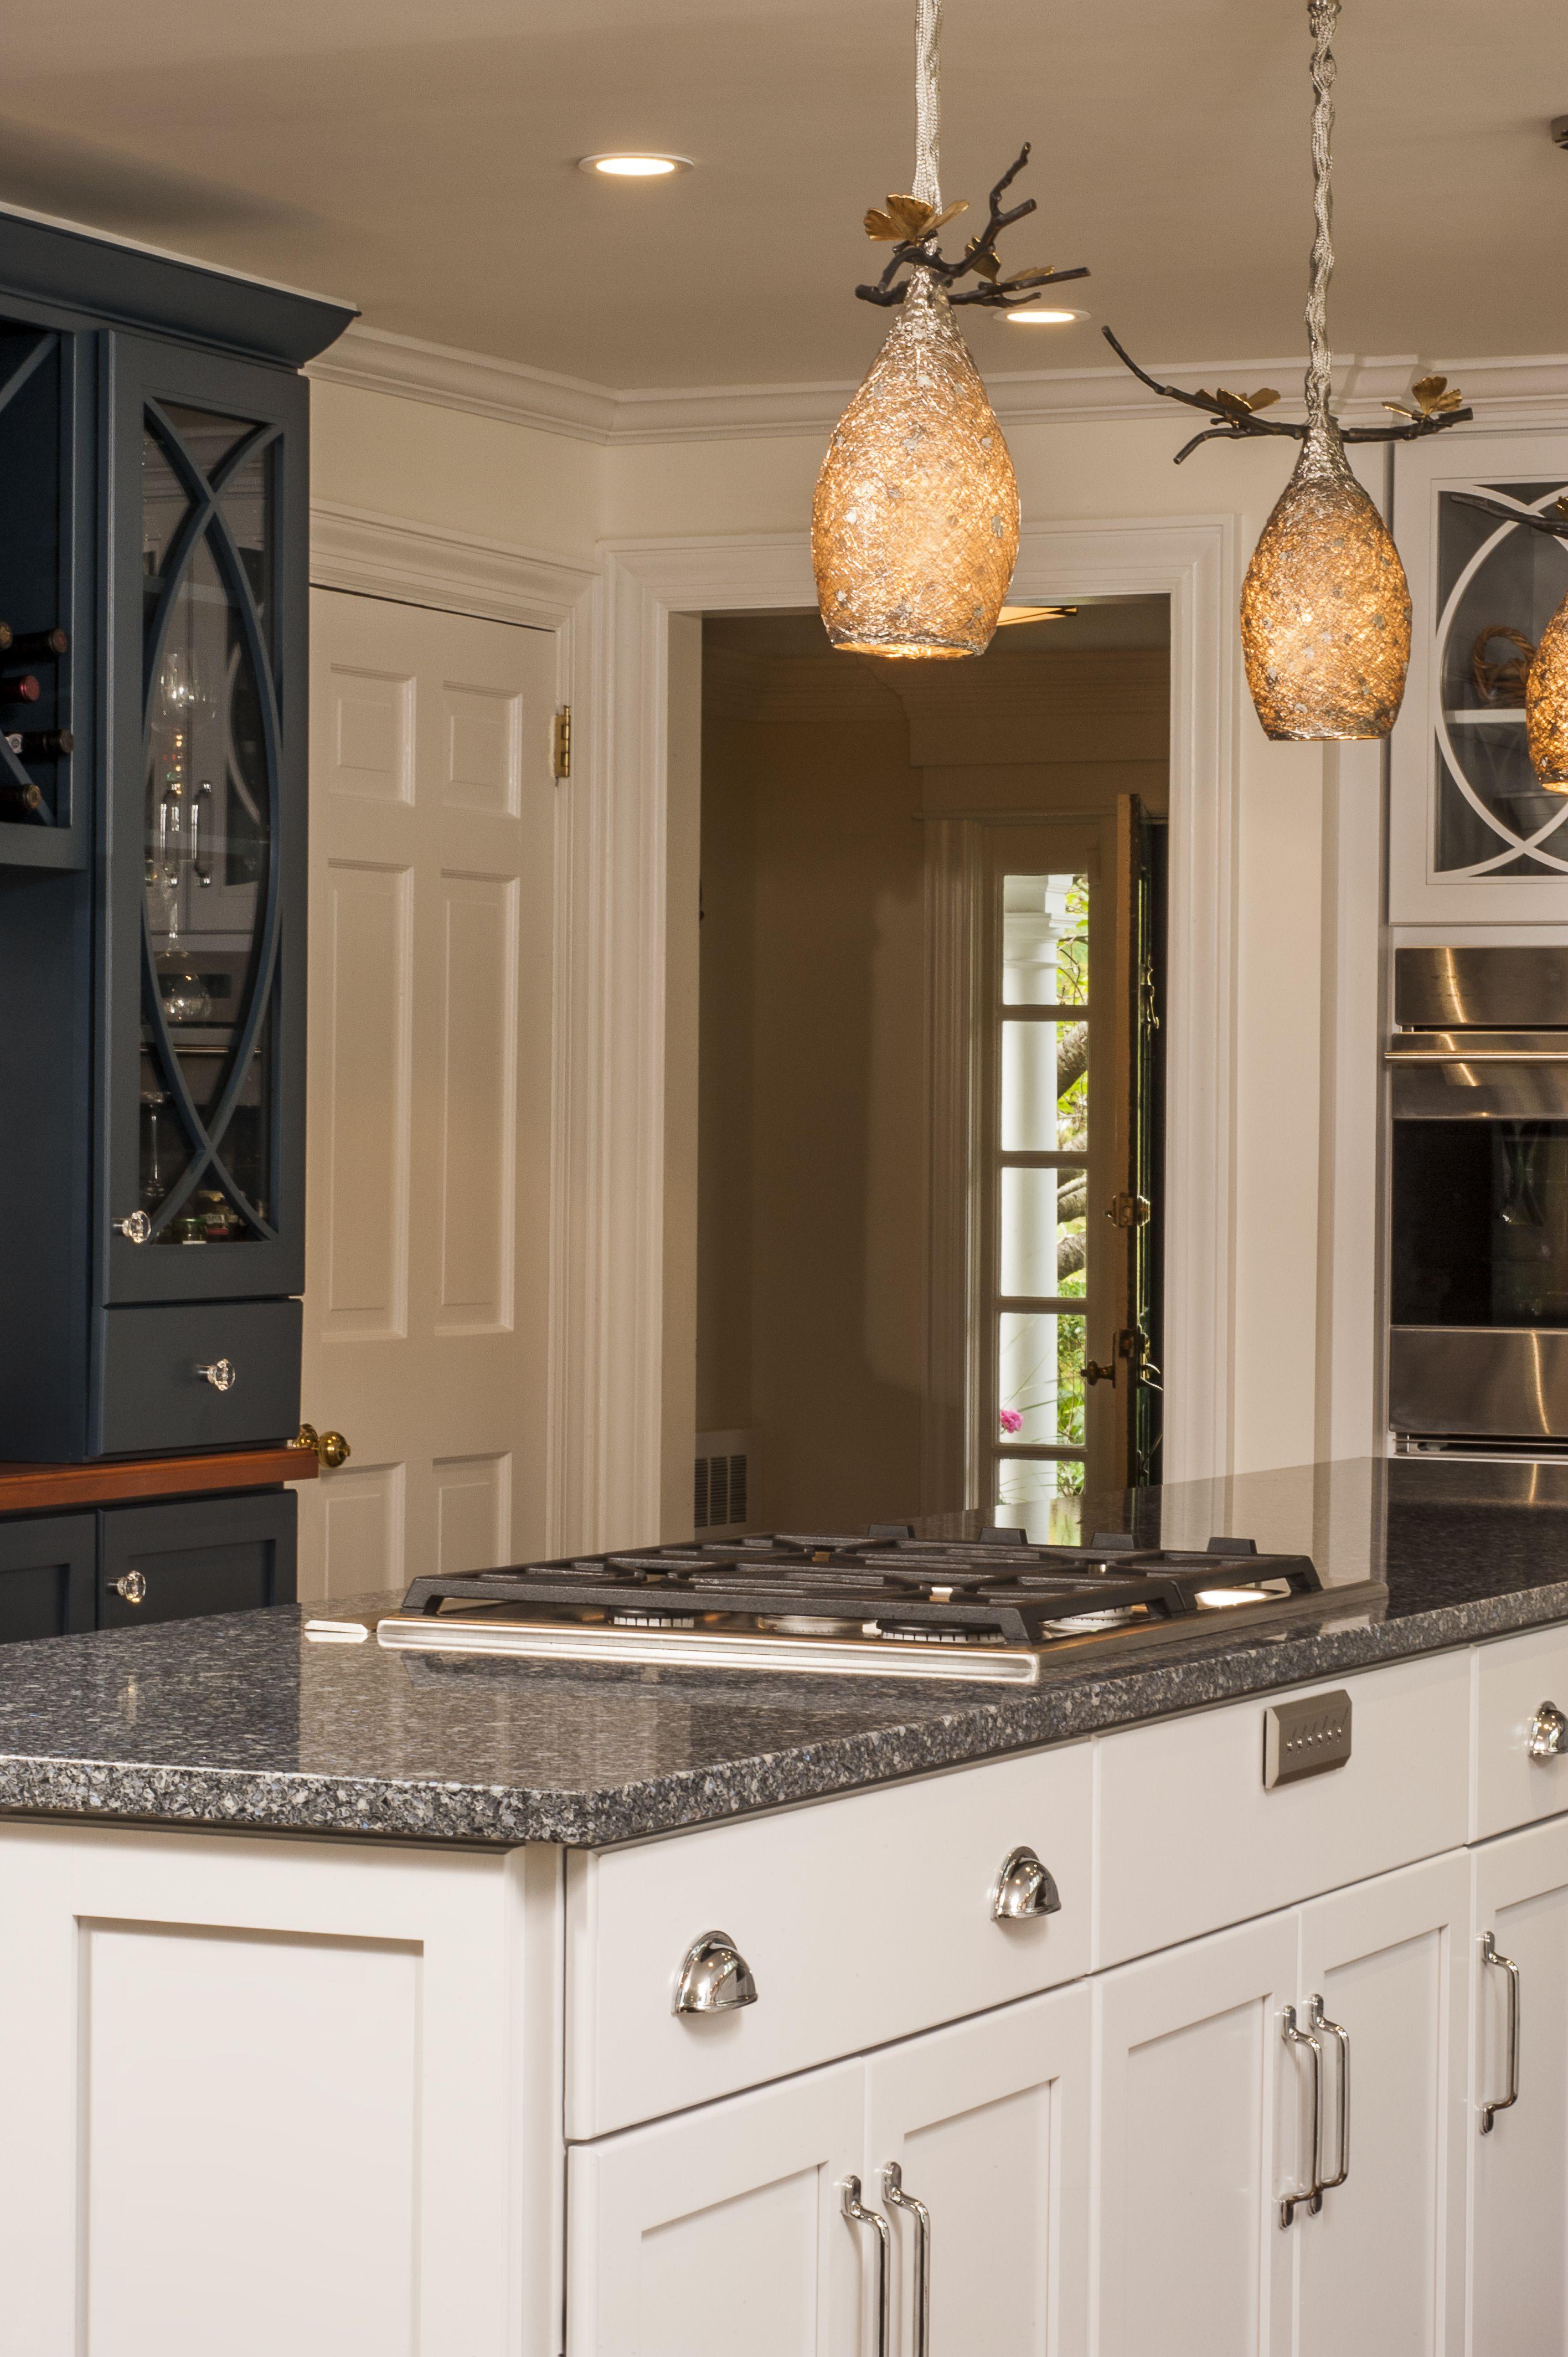 White Kitchen Cabinetry Center Island With Cambria Parys Blue Counter Tops Longislandkitchen Longislandluxurykitche Attic Remodel Attic Design Attic Flooring